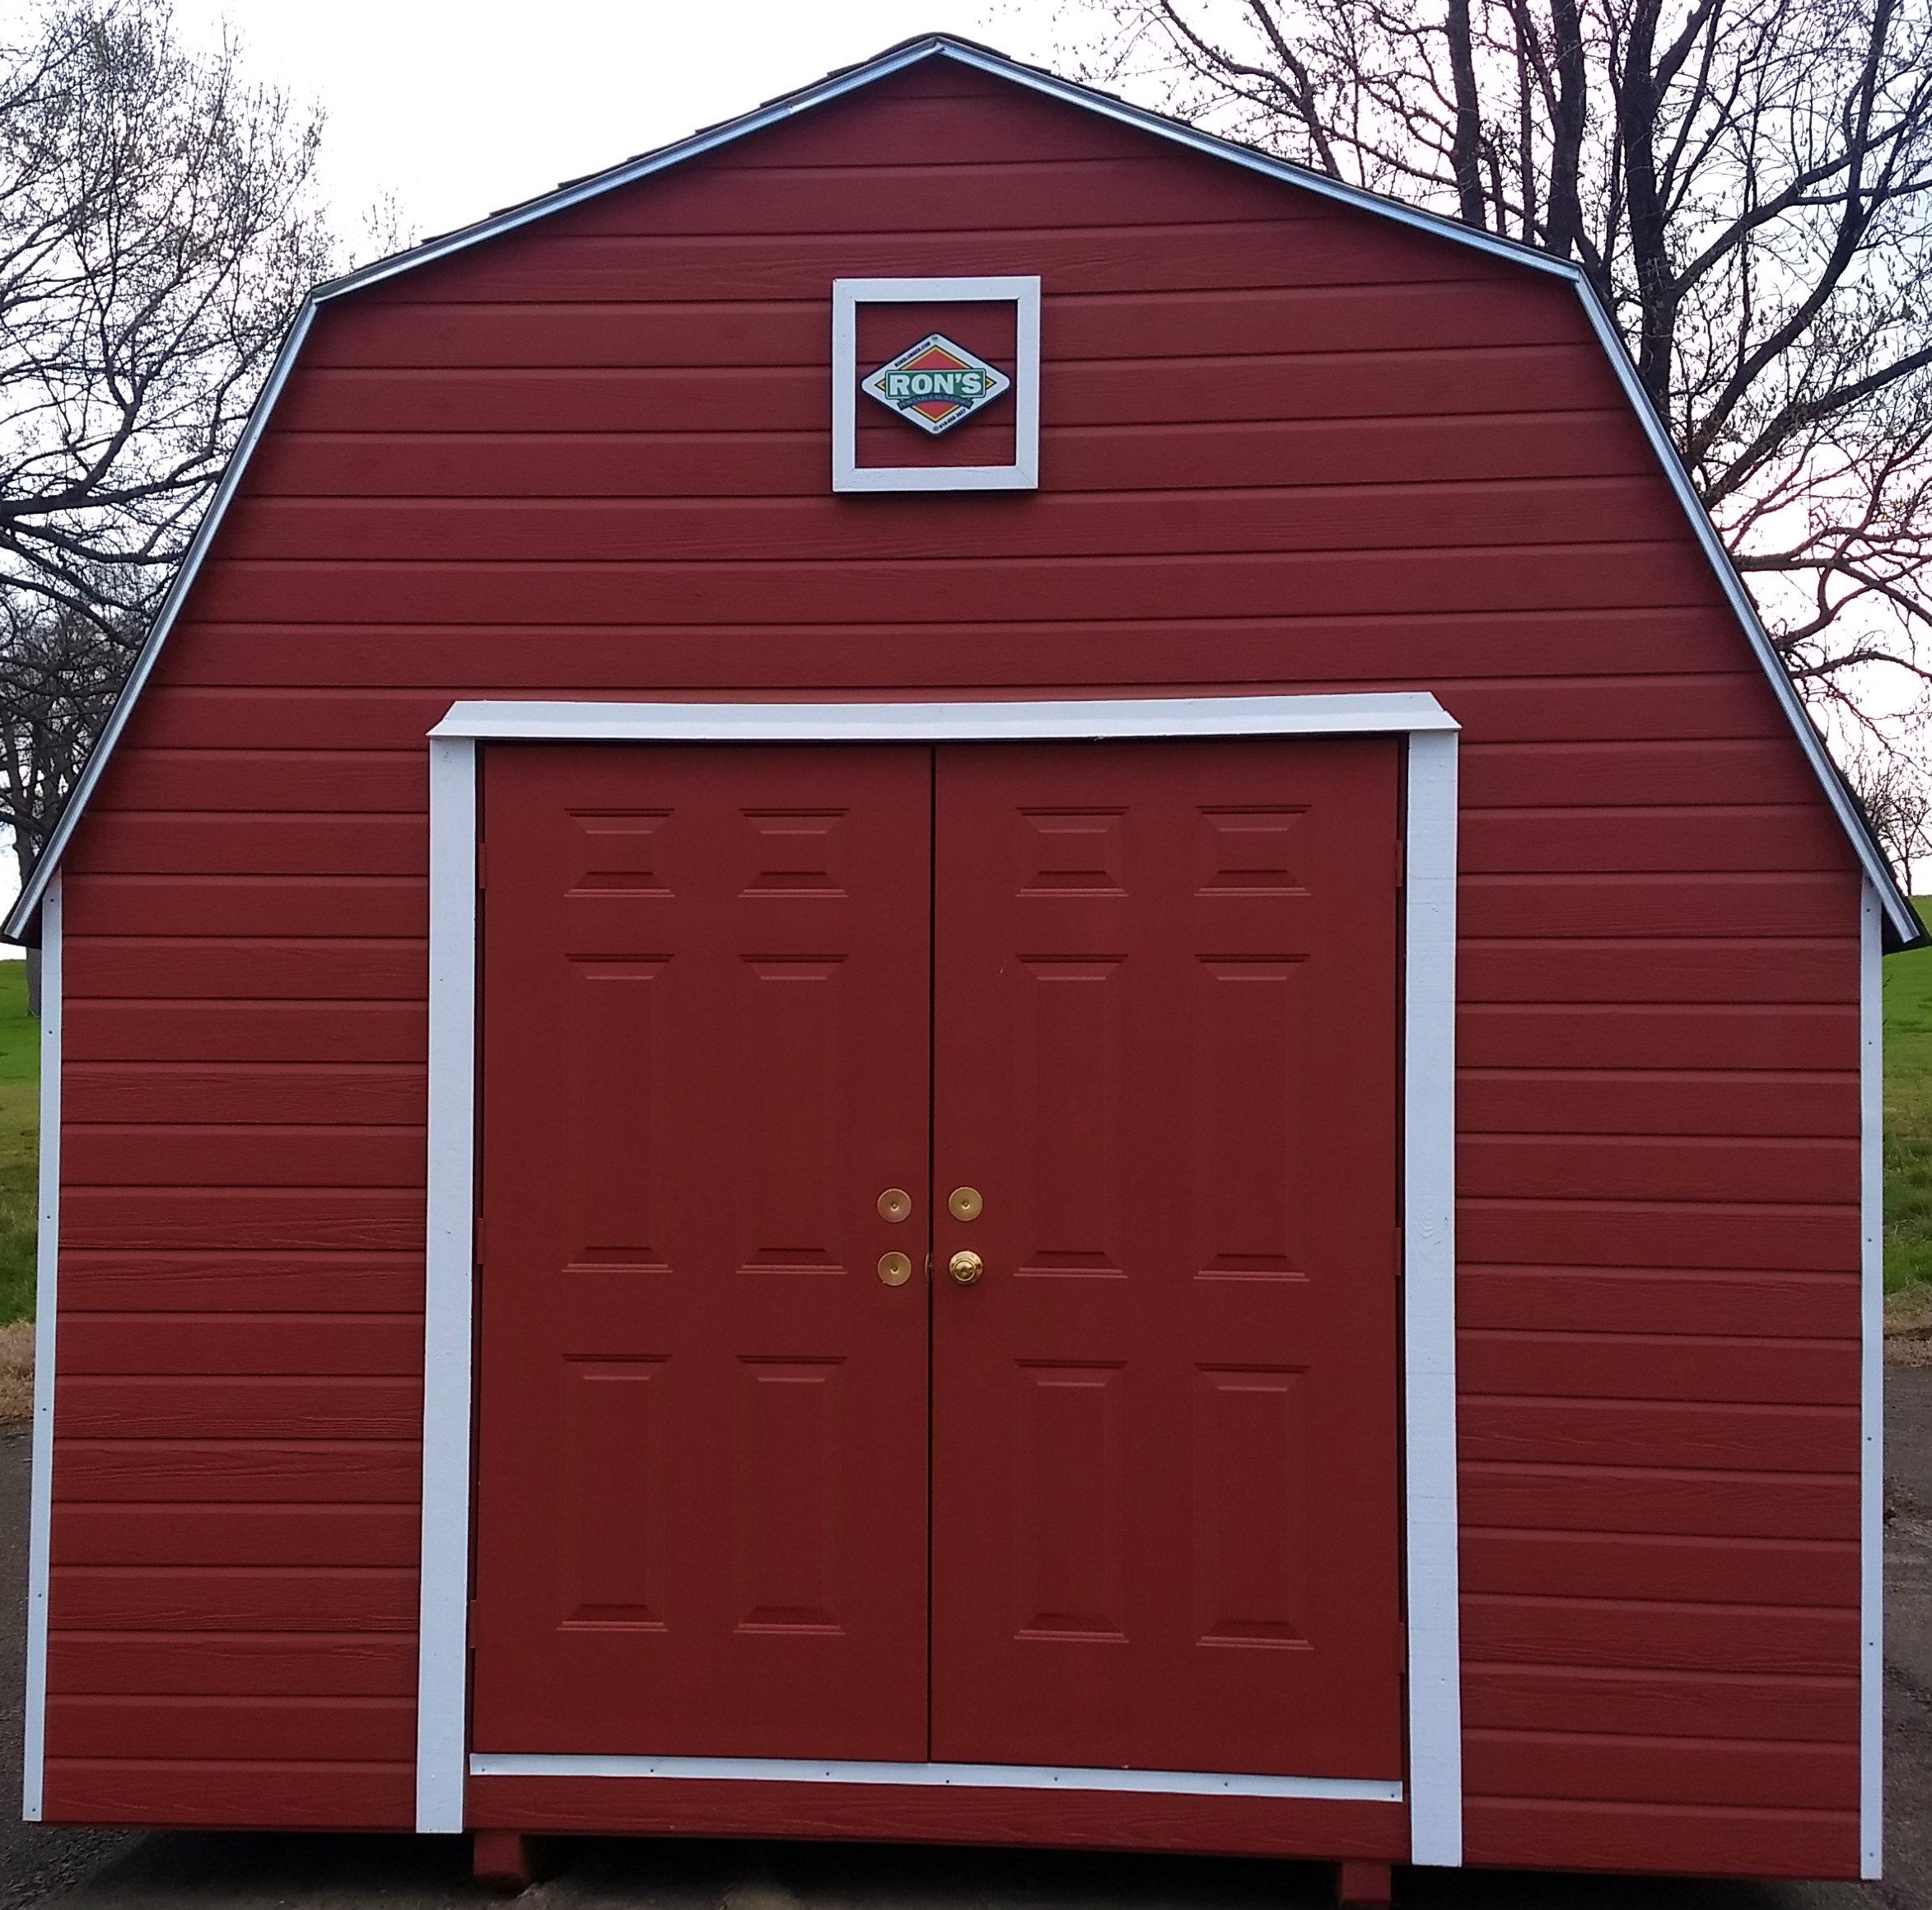 Ron's Portable Buildings image 5